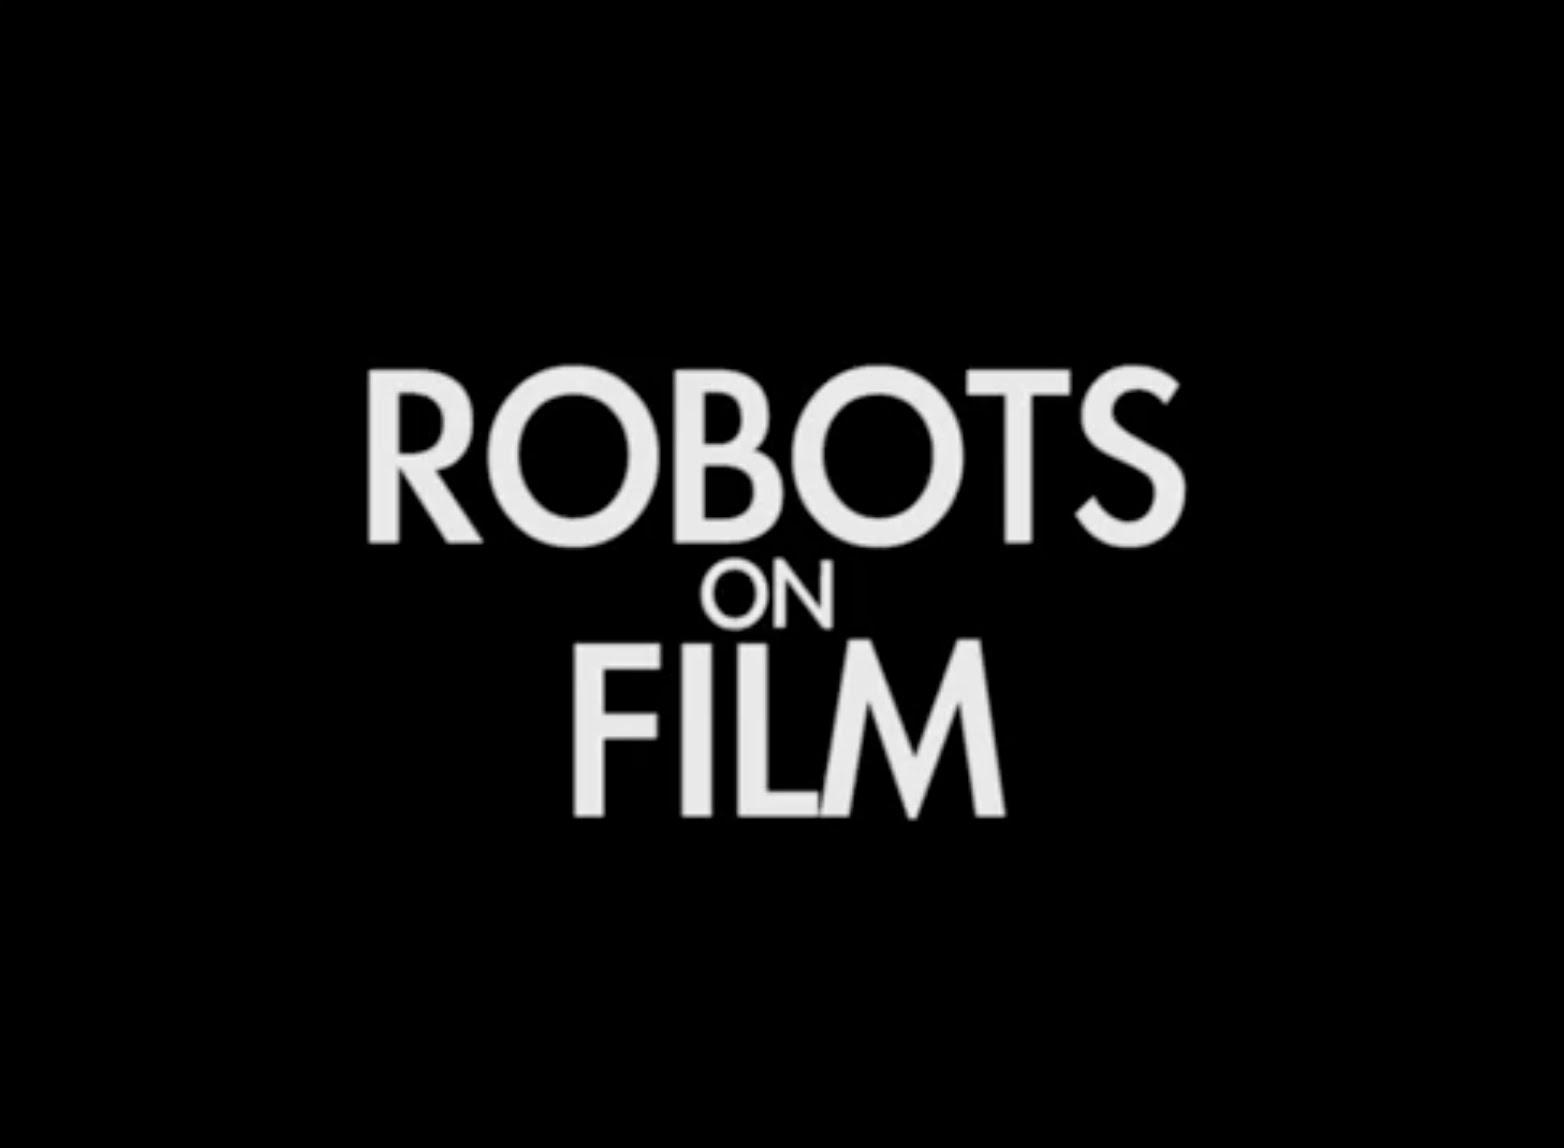 """Robots on Film"""